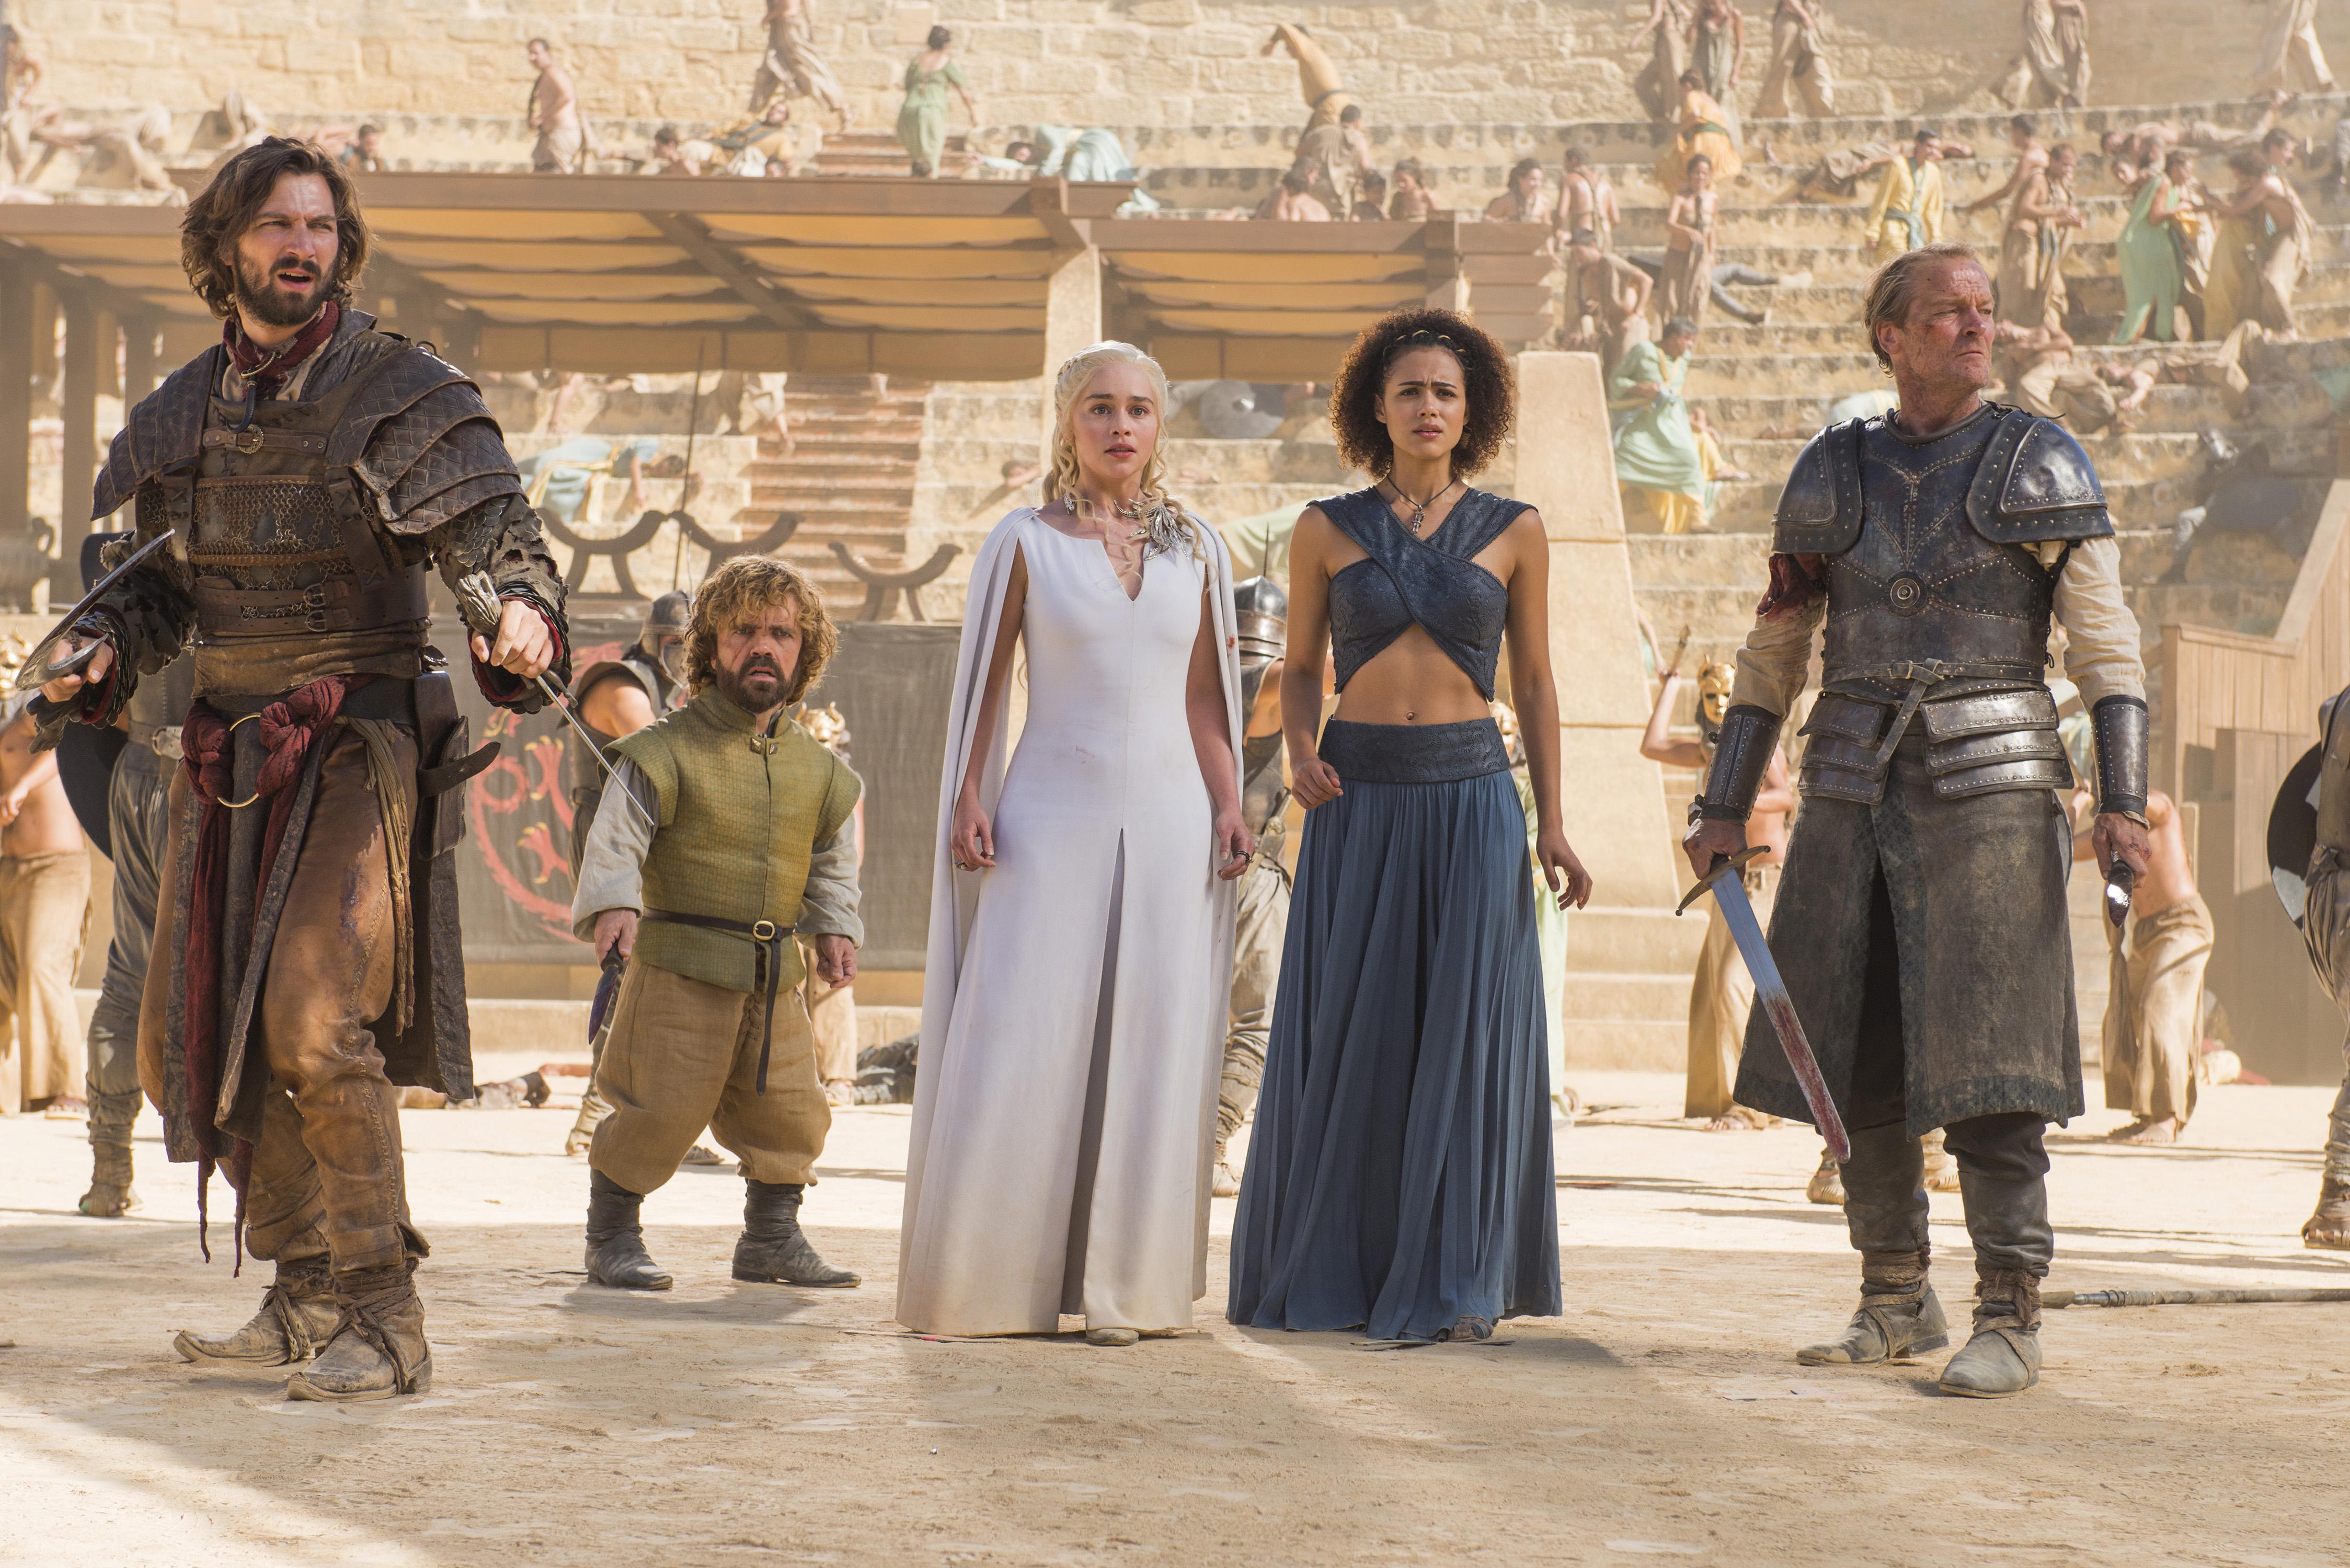 Michiel Huisman, Peter Dinklage, Emilia Clarke, Nathalie Emmanuel and Iain Glen in 'Game of Thrones'